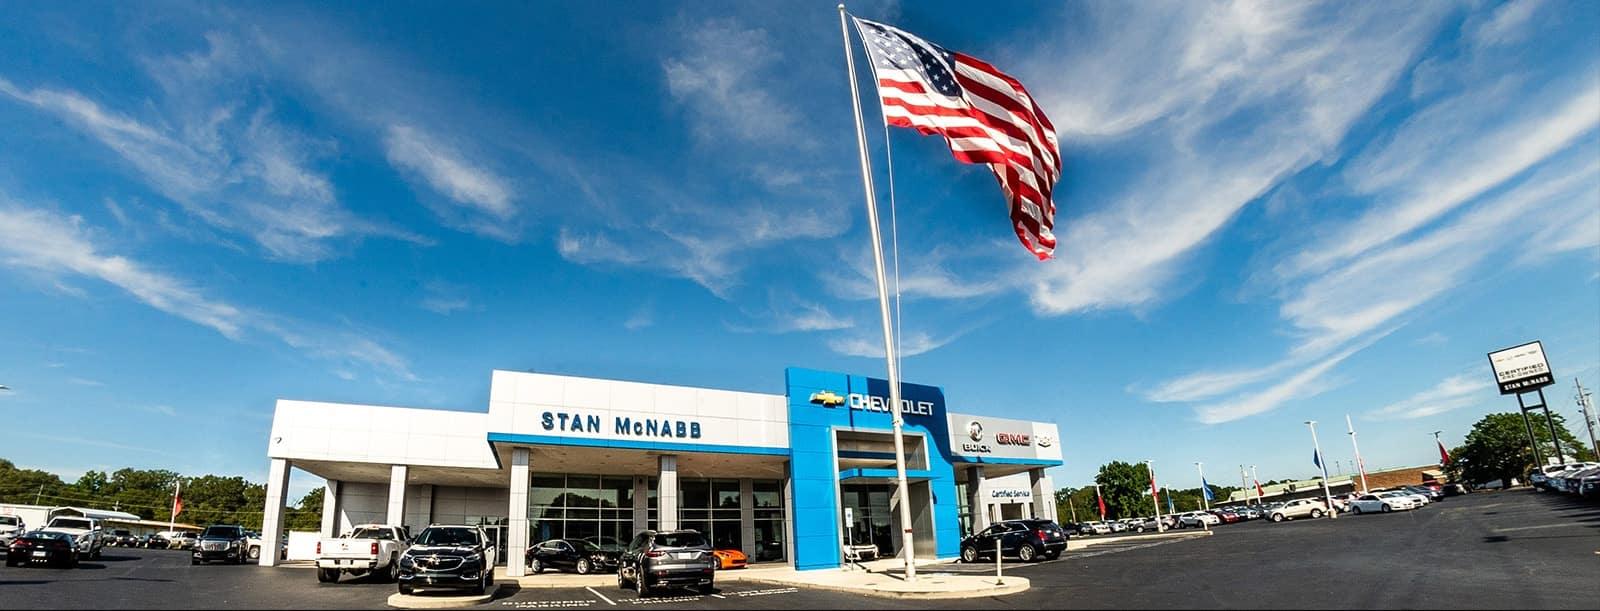 Stan Mcnabb Chevrolet Buick Gmc Buick Chevrolet Gmc Dealer In Tullahoma Tn